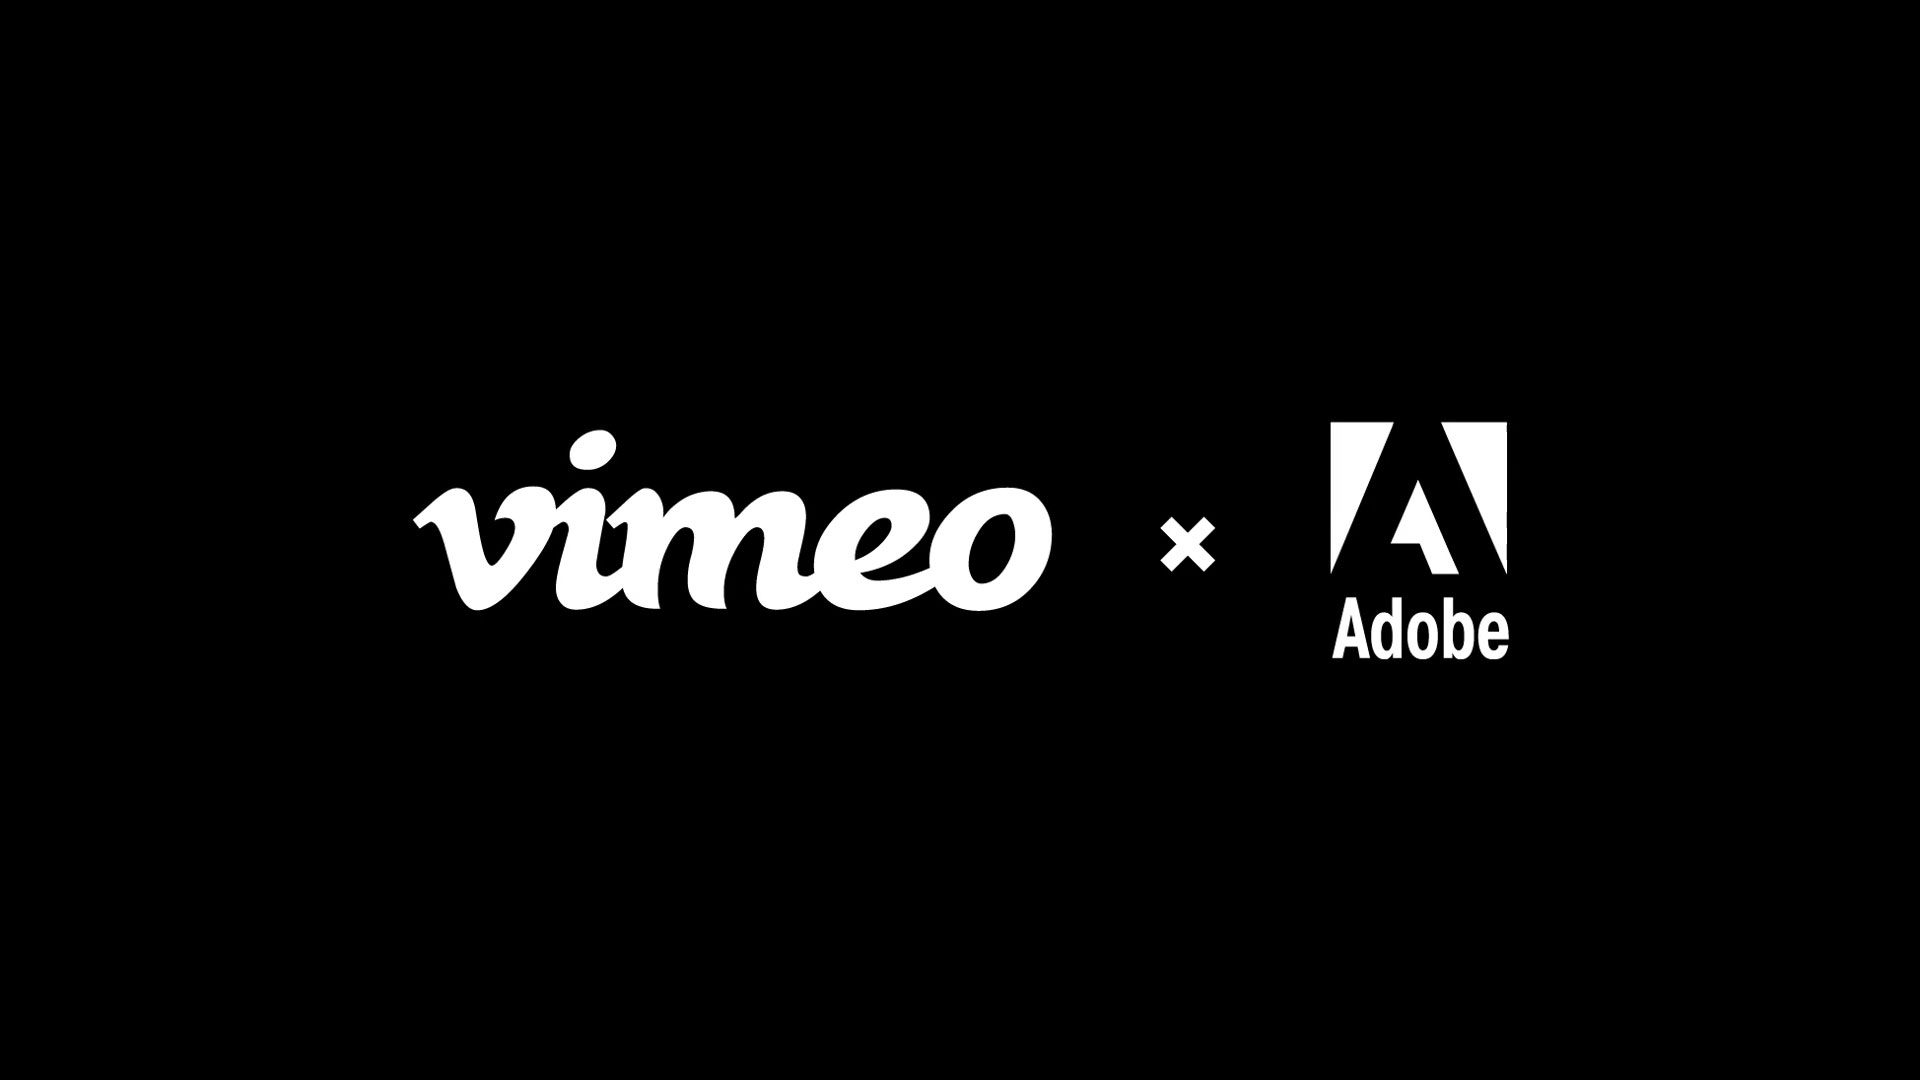 VimeoがPremiere Pro CCの操作パネルを導入